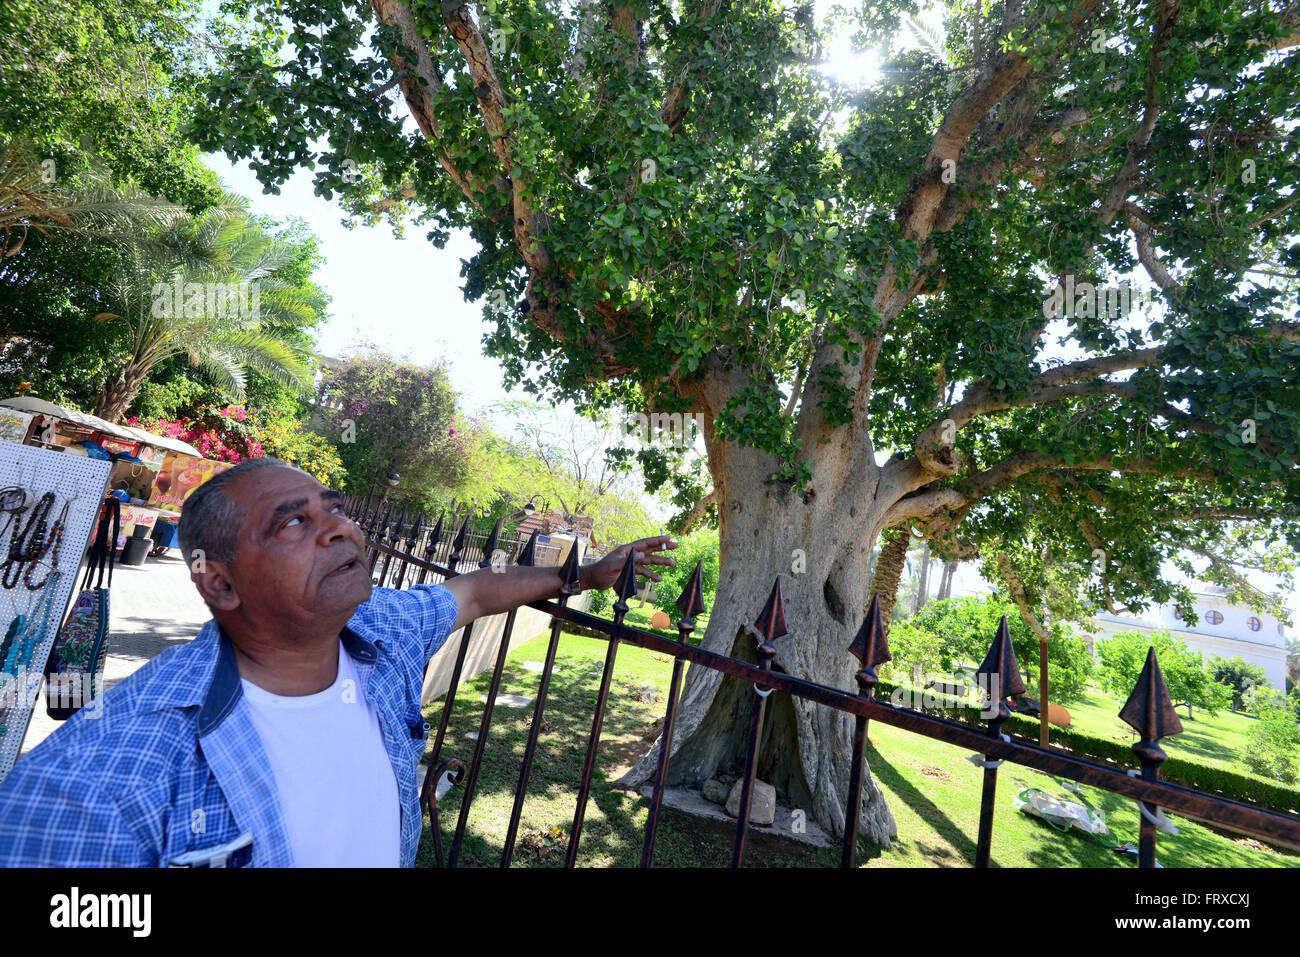 Fig tree in Jericho, Palestine near Israel - Stock Image